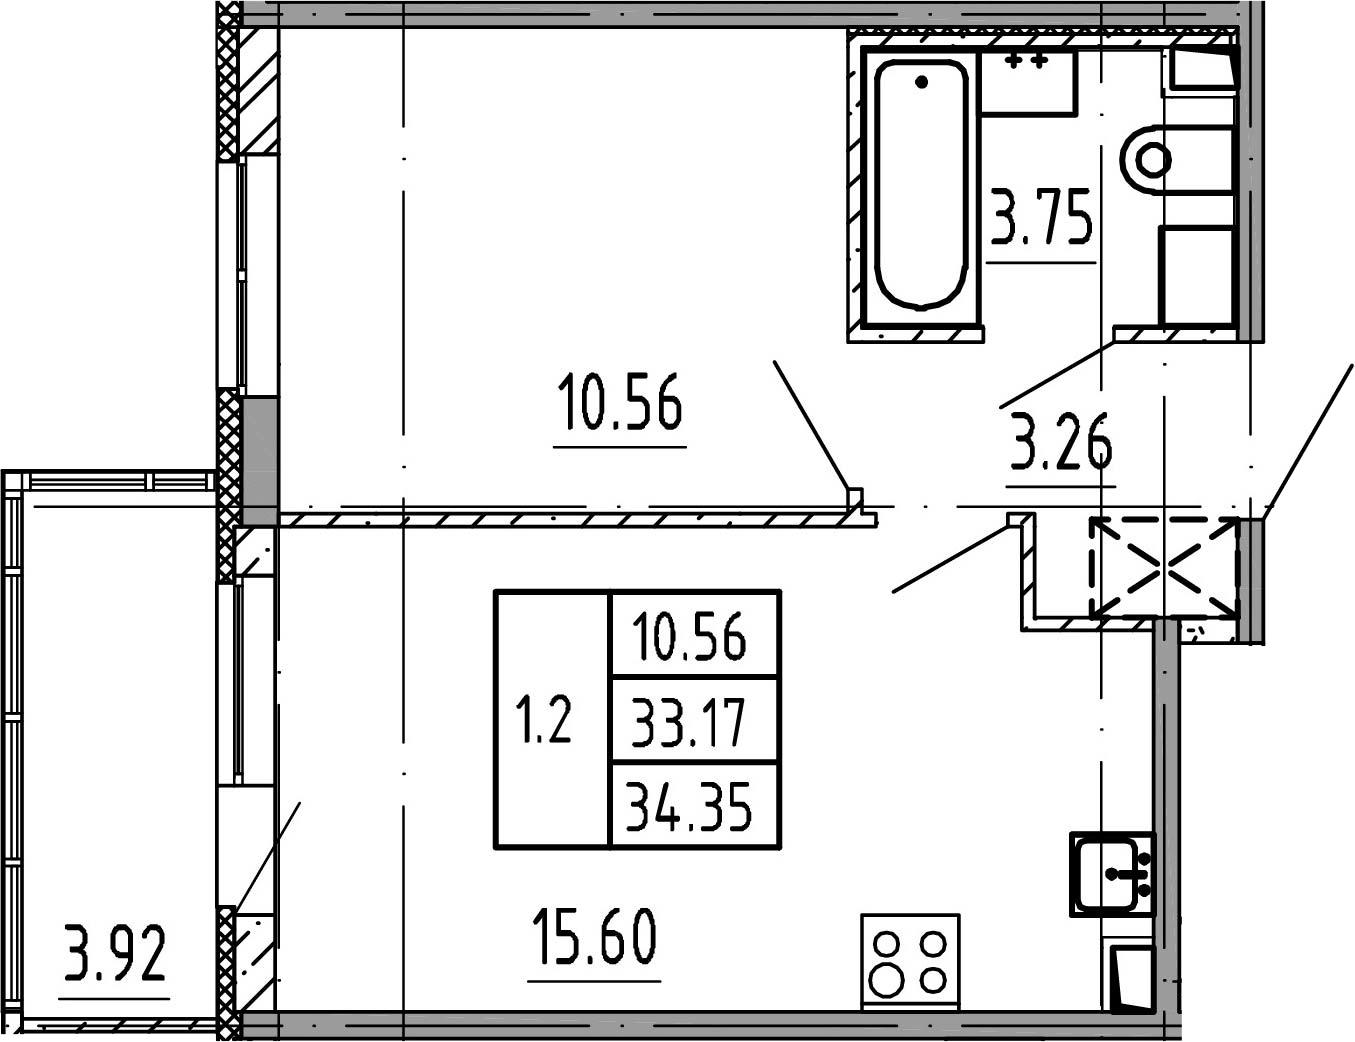 2Е-к.кв, 33.17 м²